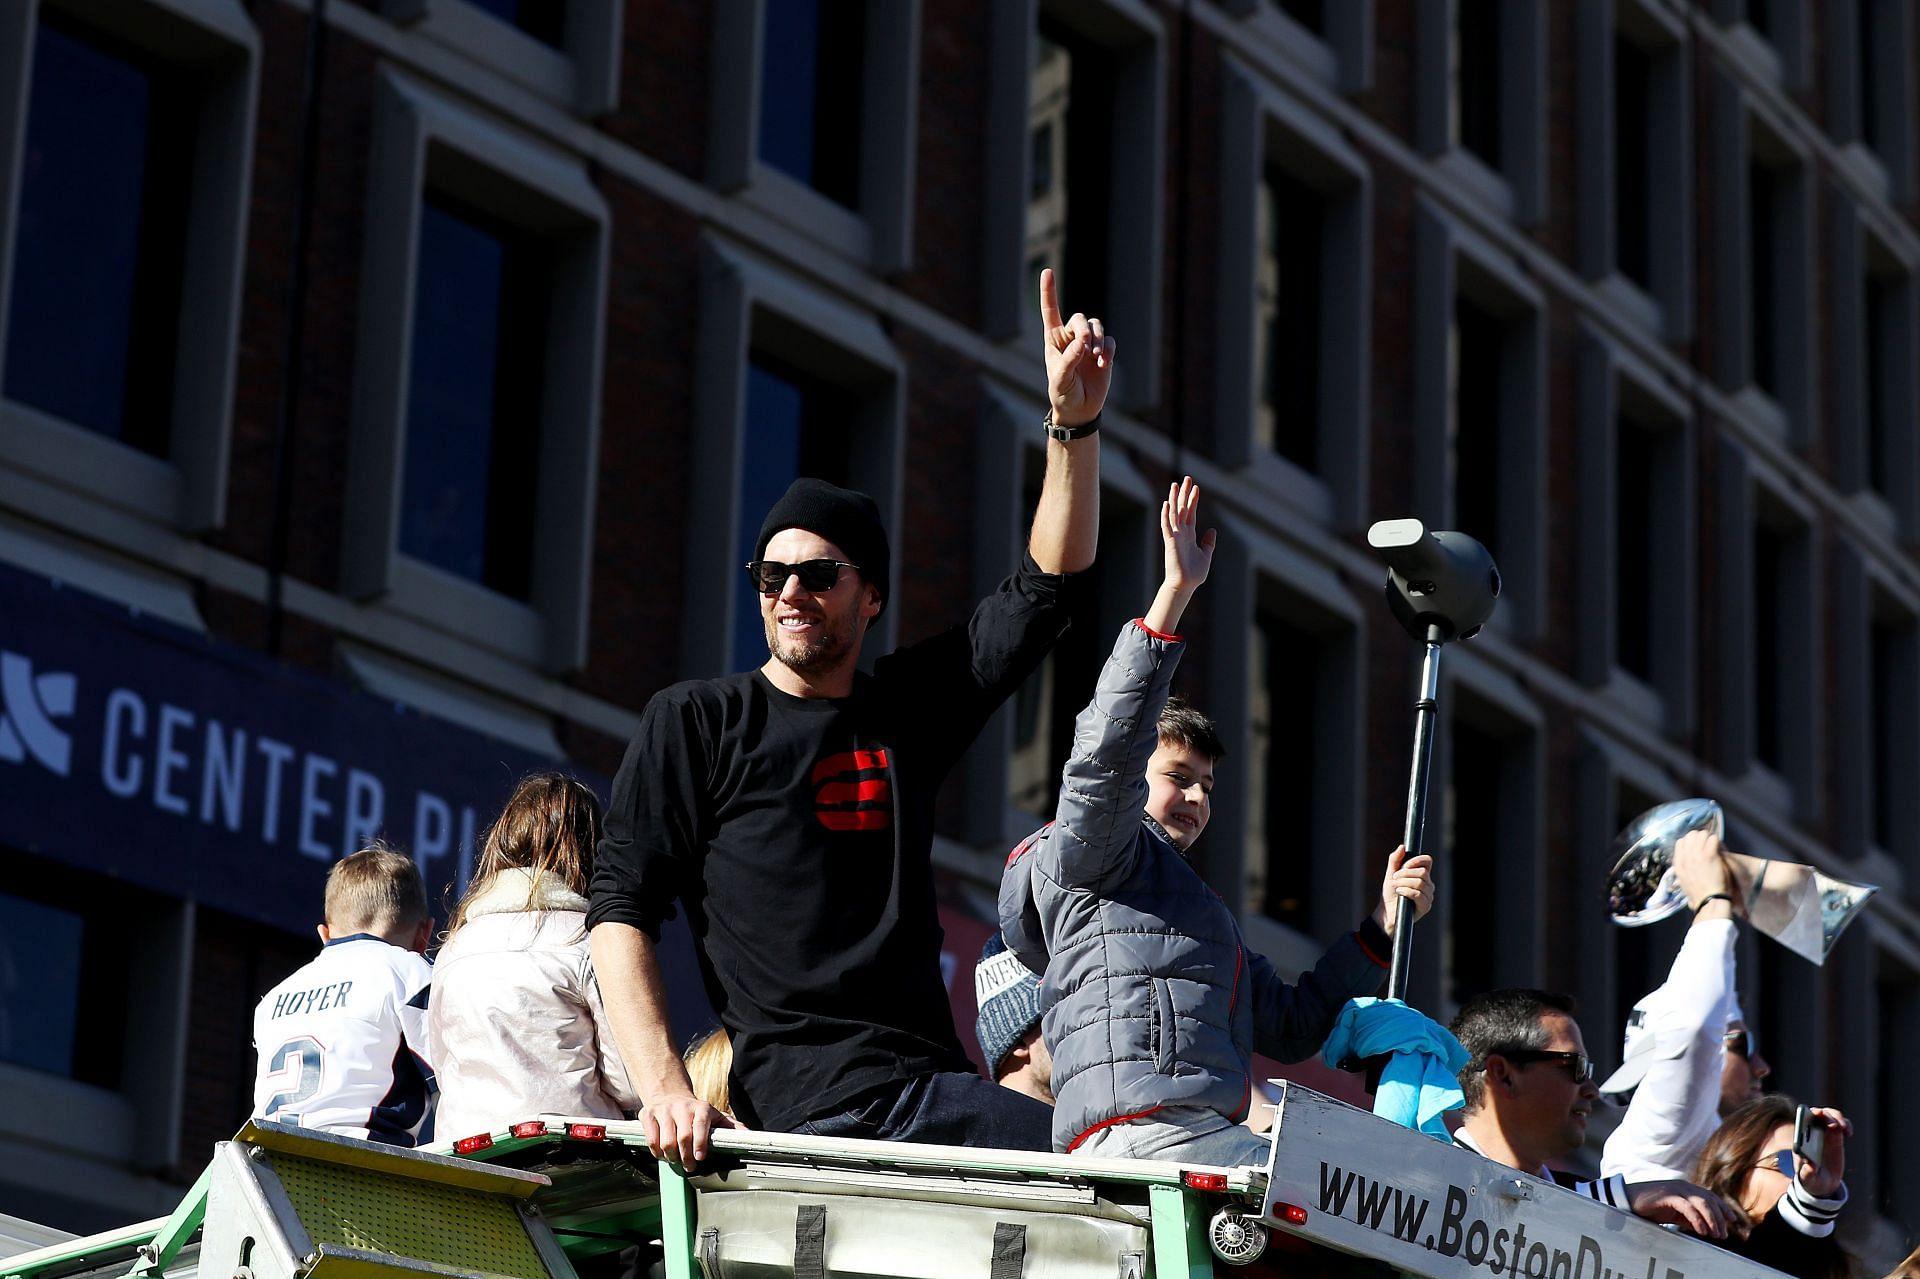 New England Patriots Victory Parade - Tom Brady with his son Jack